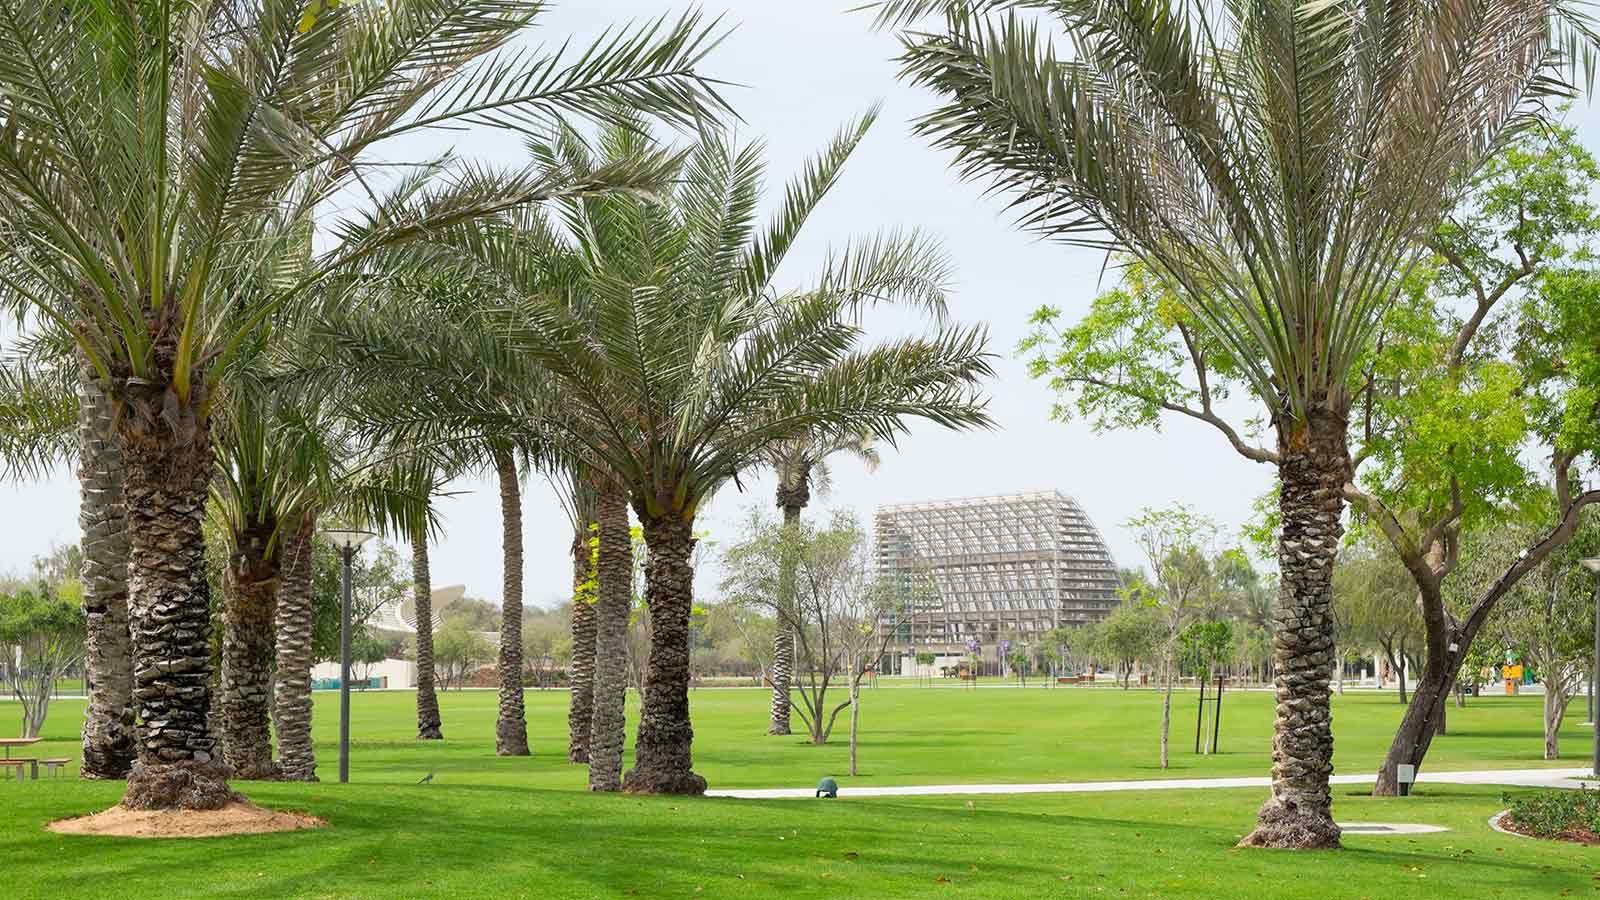 Palm Trees at Umm Al Emarat Park - Mace Group